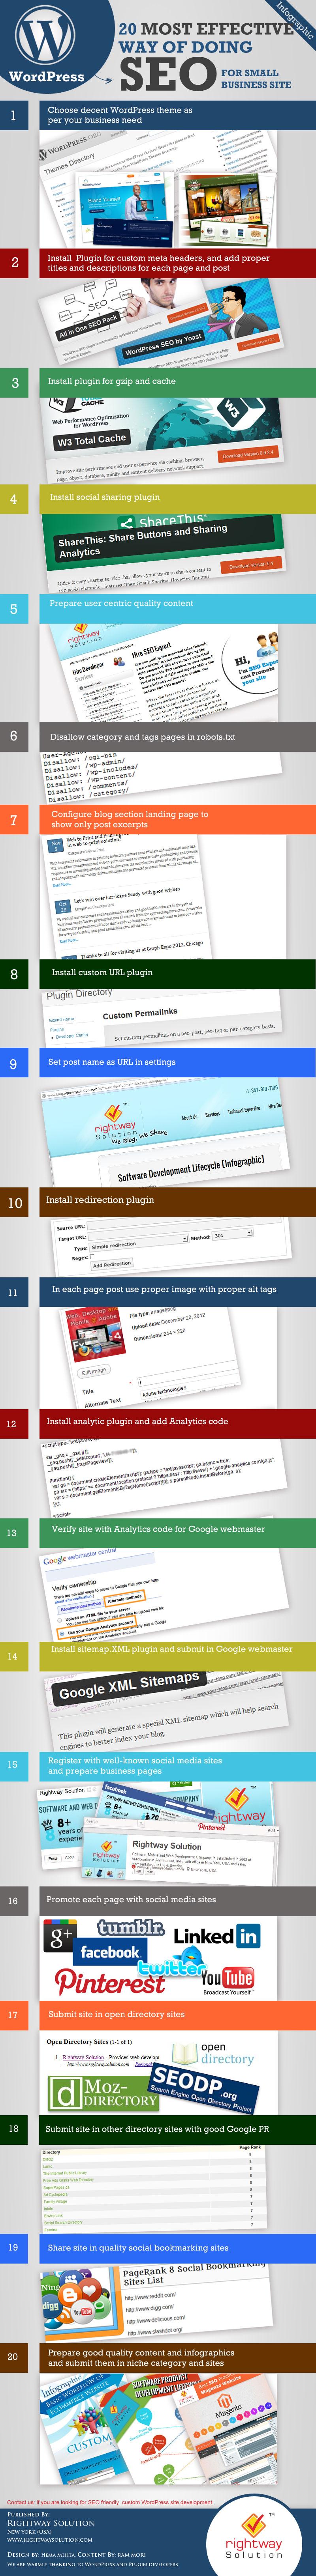 infografia trucos mas efectivos de seo Infografía: Los trucos mas efectivos de SEO para Wordpress